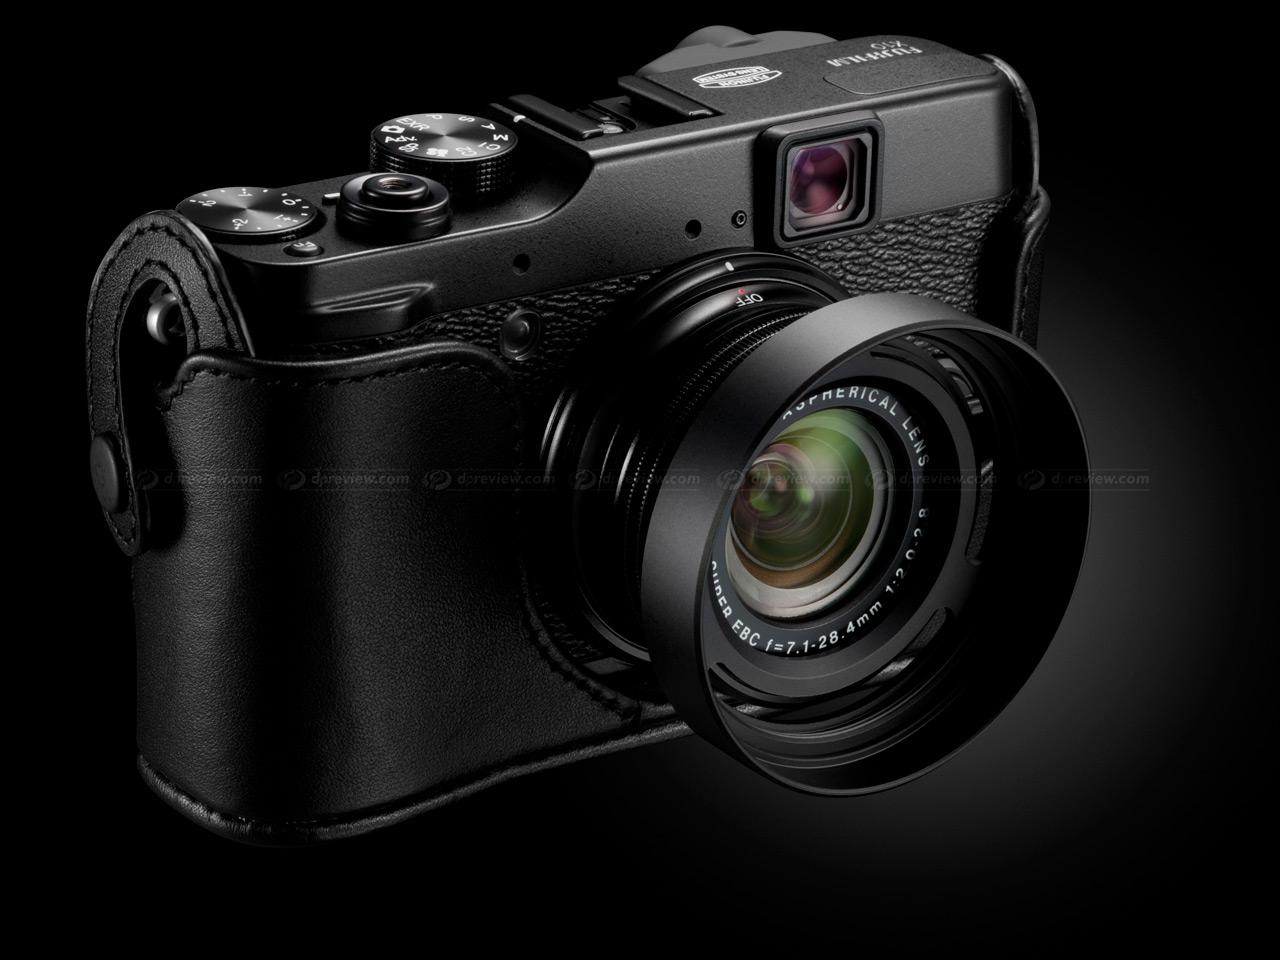 New X Series Cameras For A Kiwiretrospective